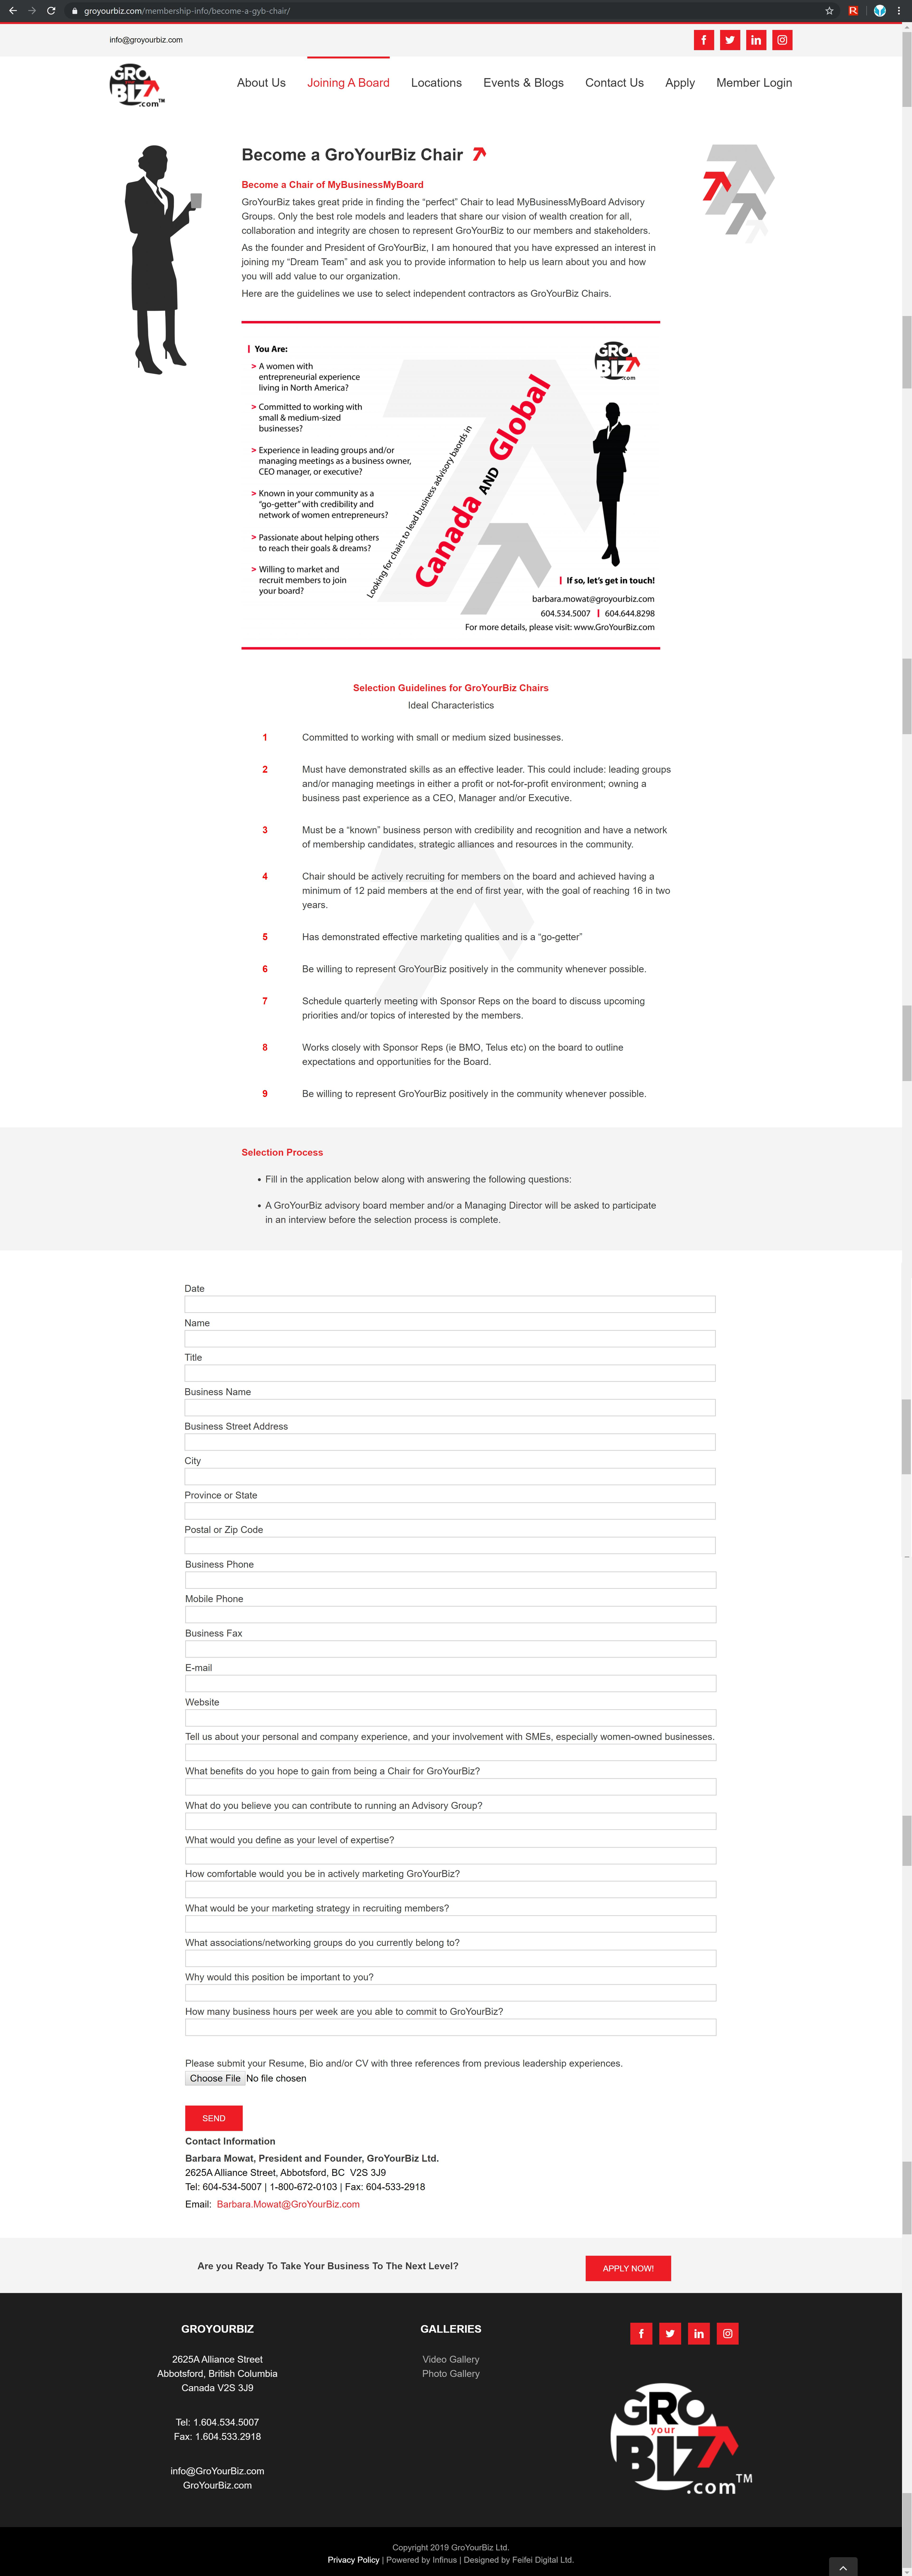 GroYourBiz Become A GYB Chair Page | User Interface and Front End Development | Feifei Digital | Monika Szucs